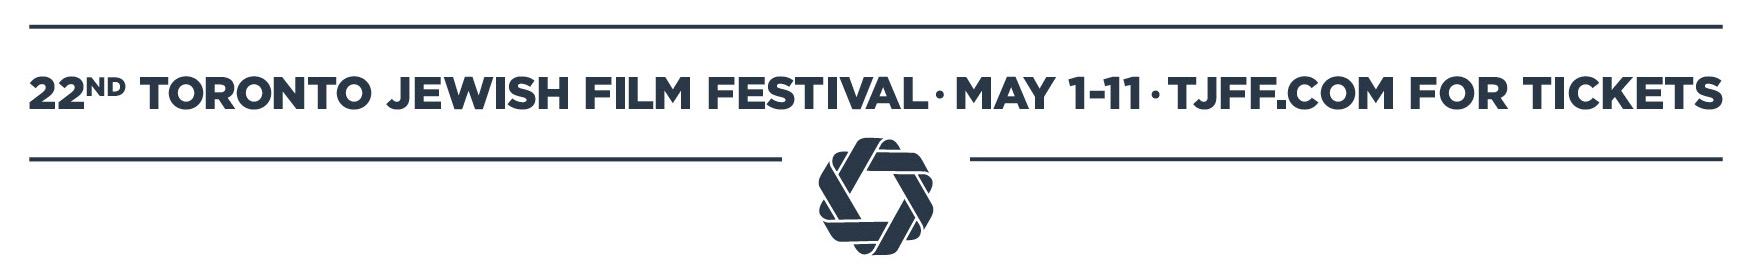 toronto jewish film festival-logo